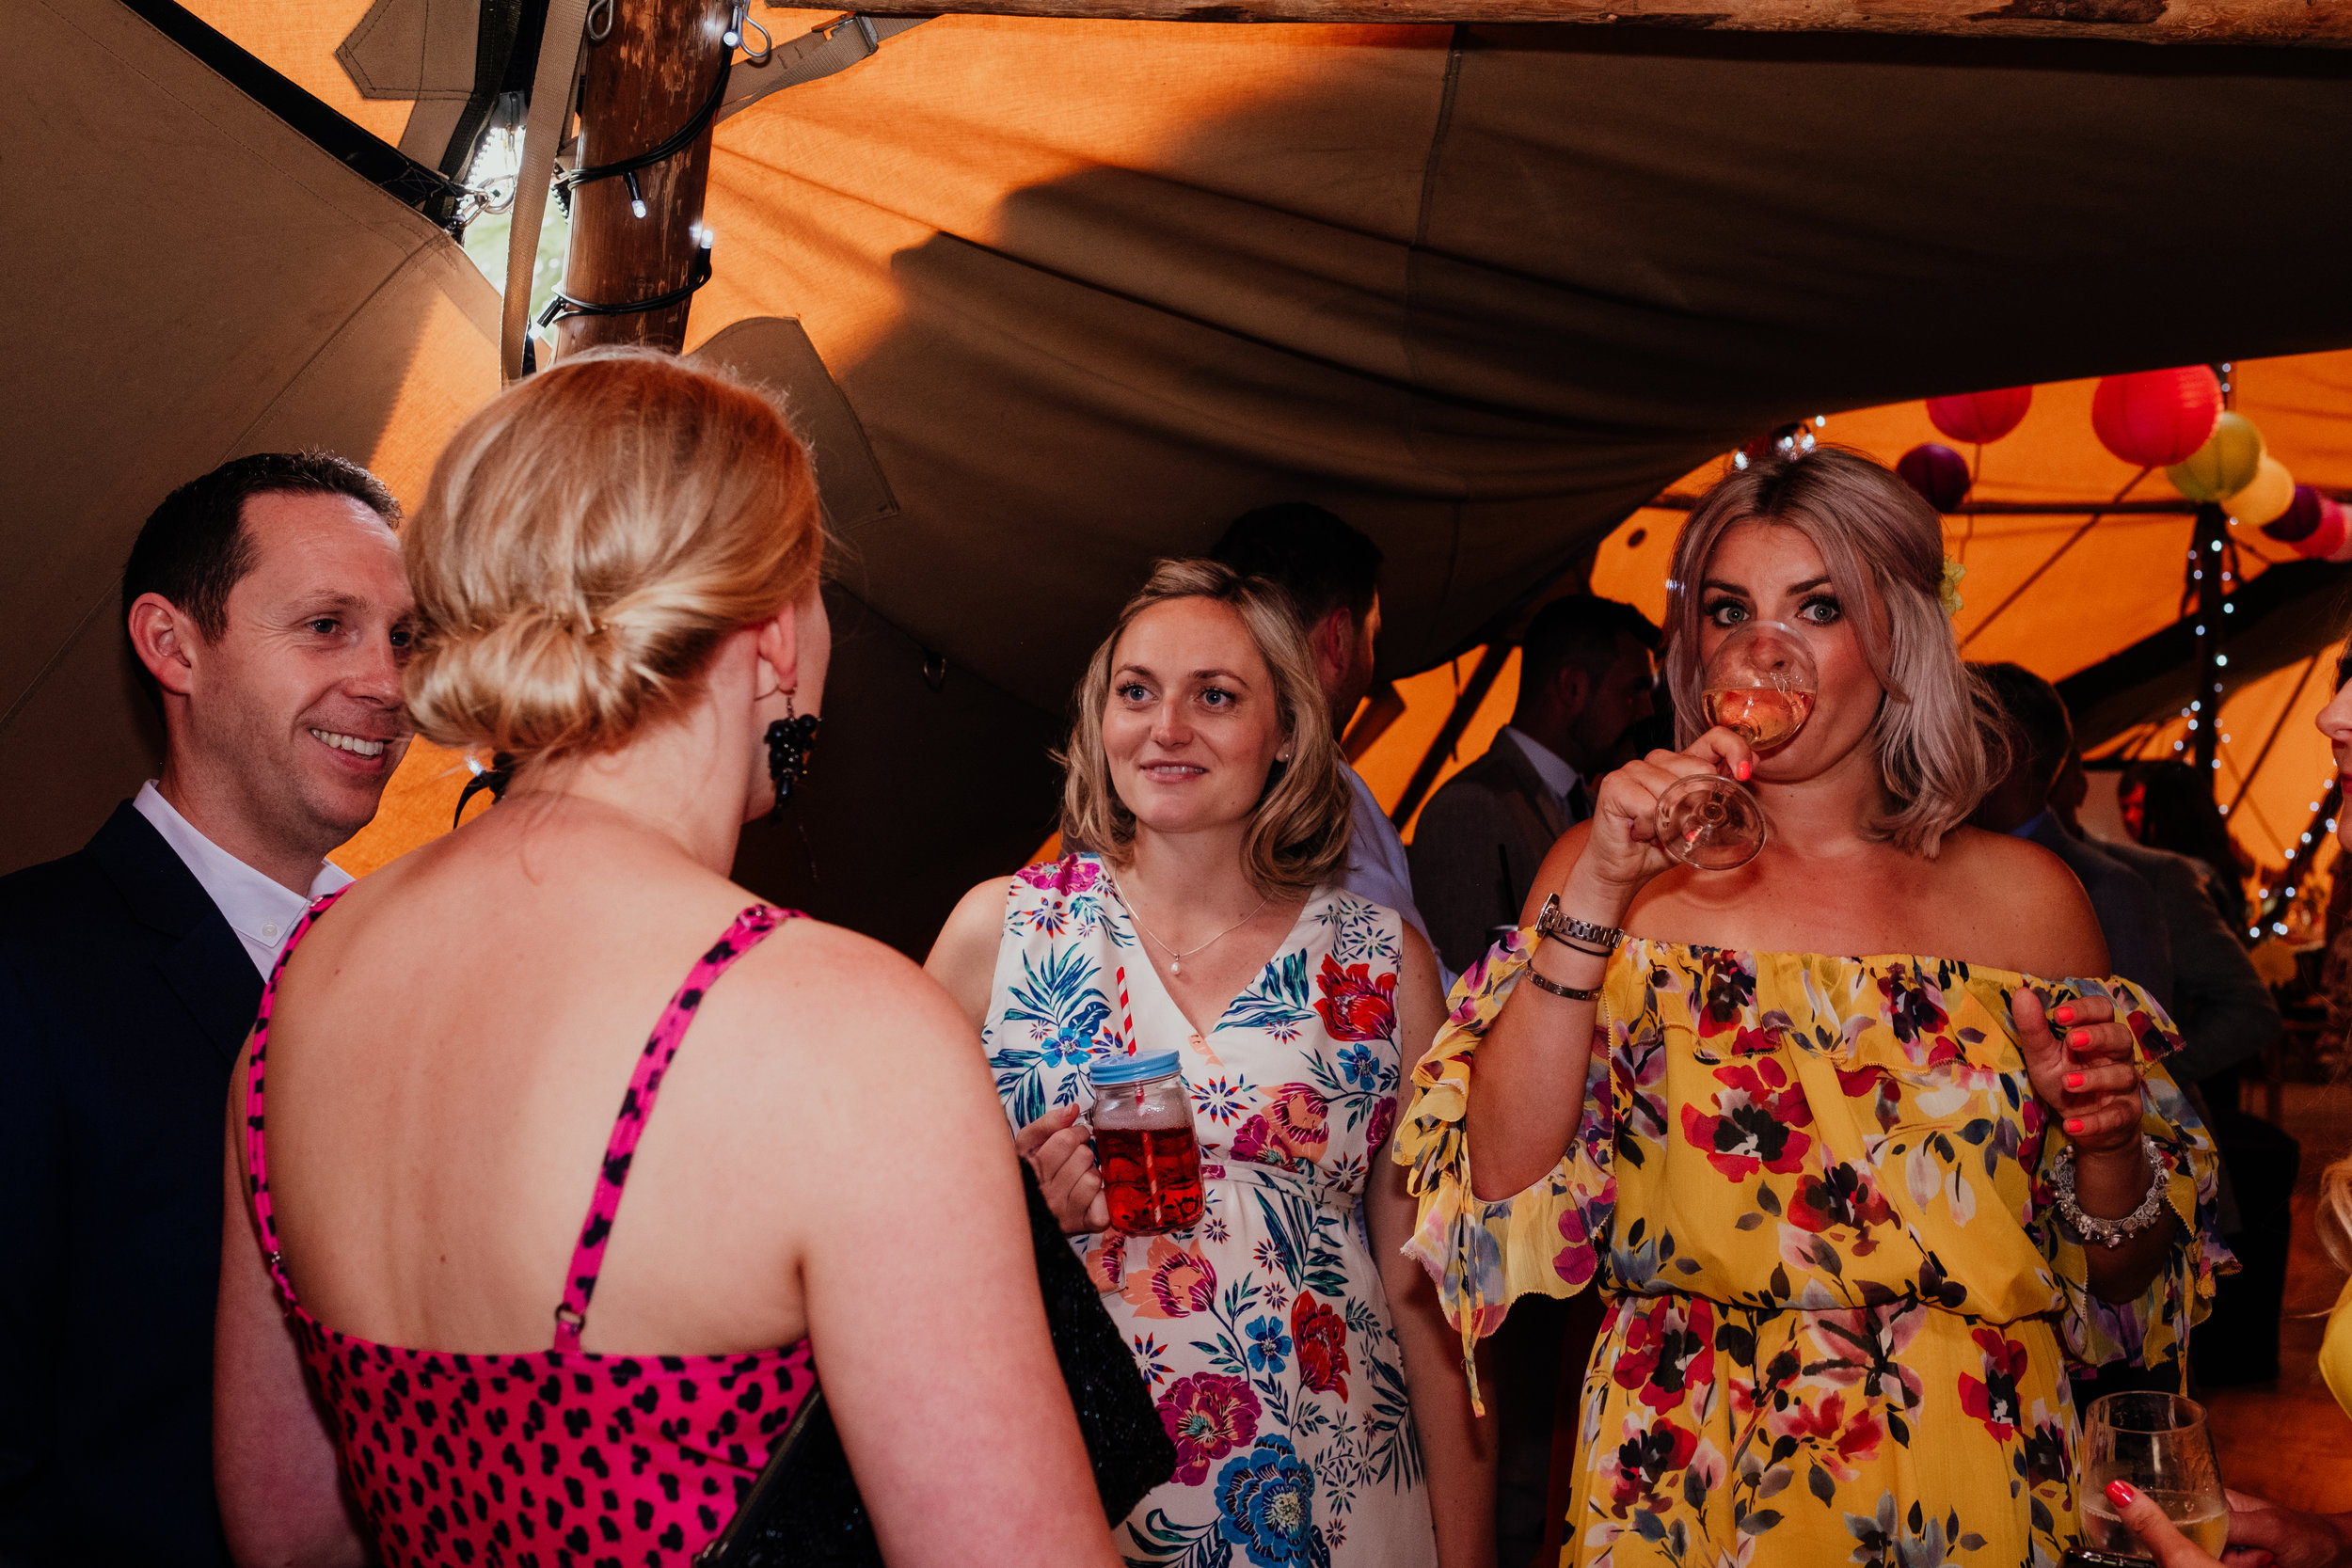 Wedding guests drinking wine